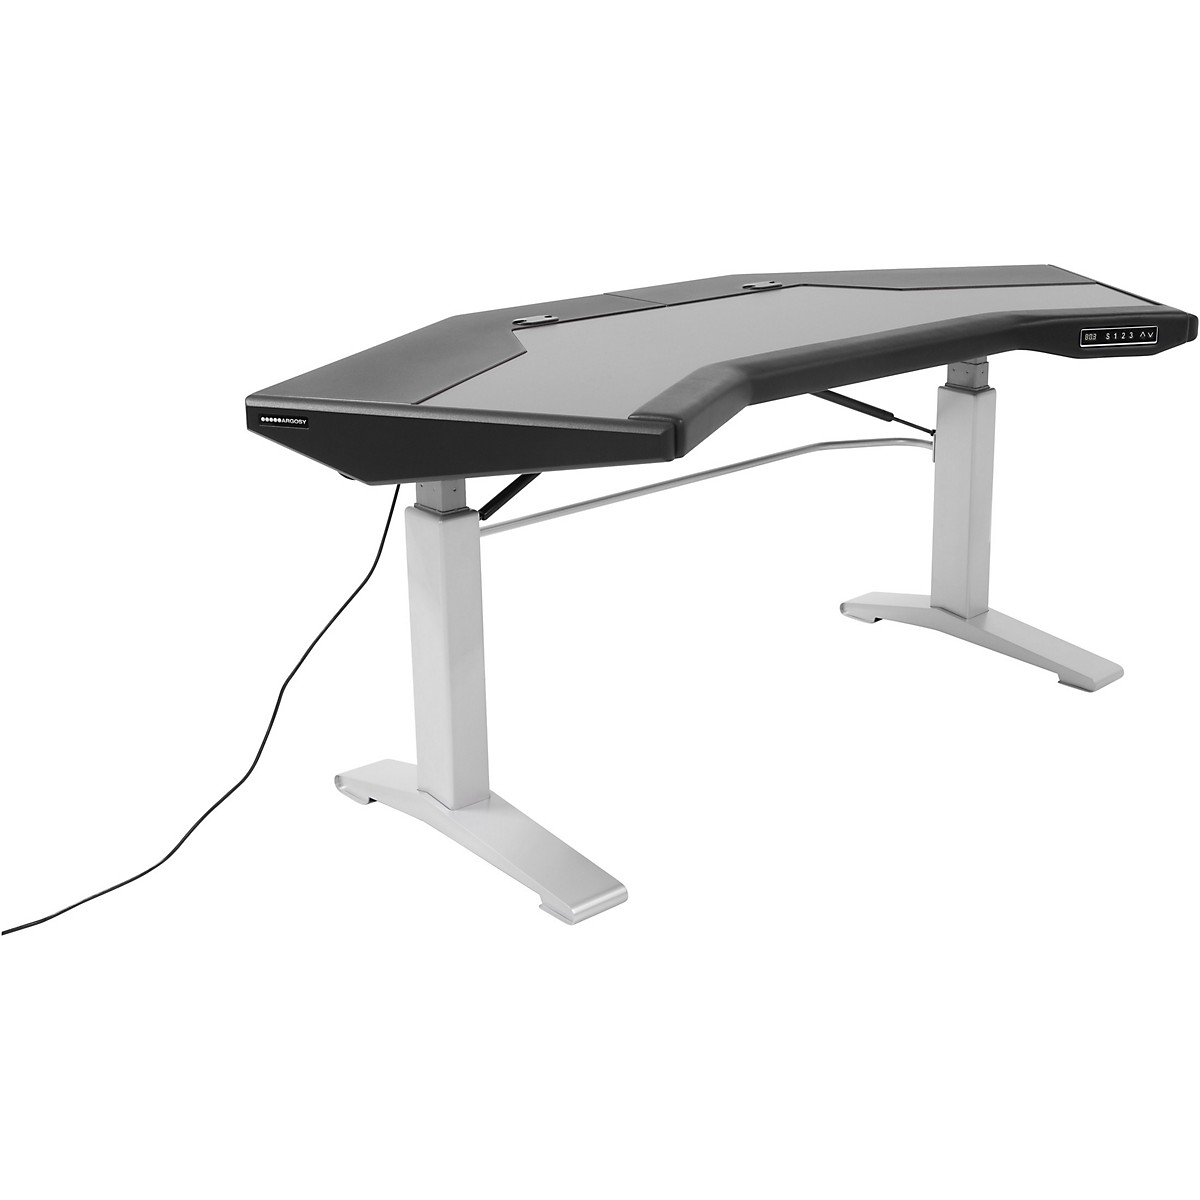 Argosy Halo G Height Adjustable Desk